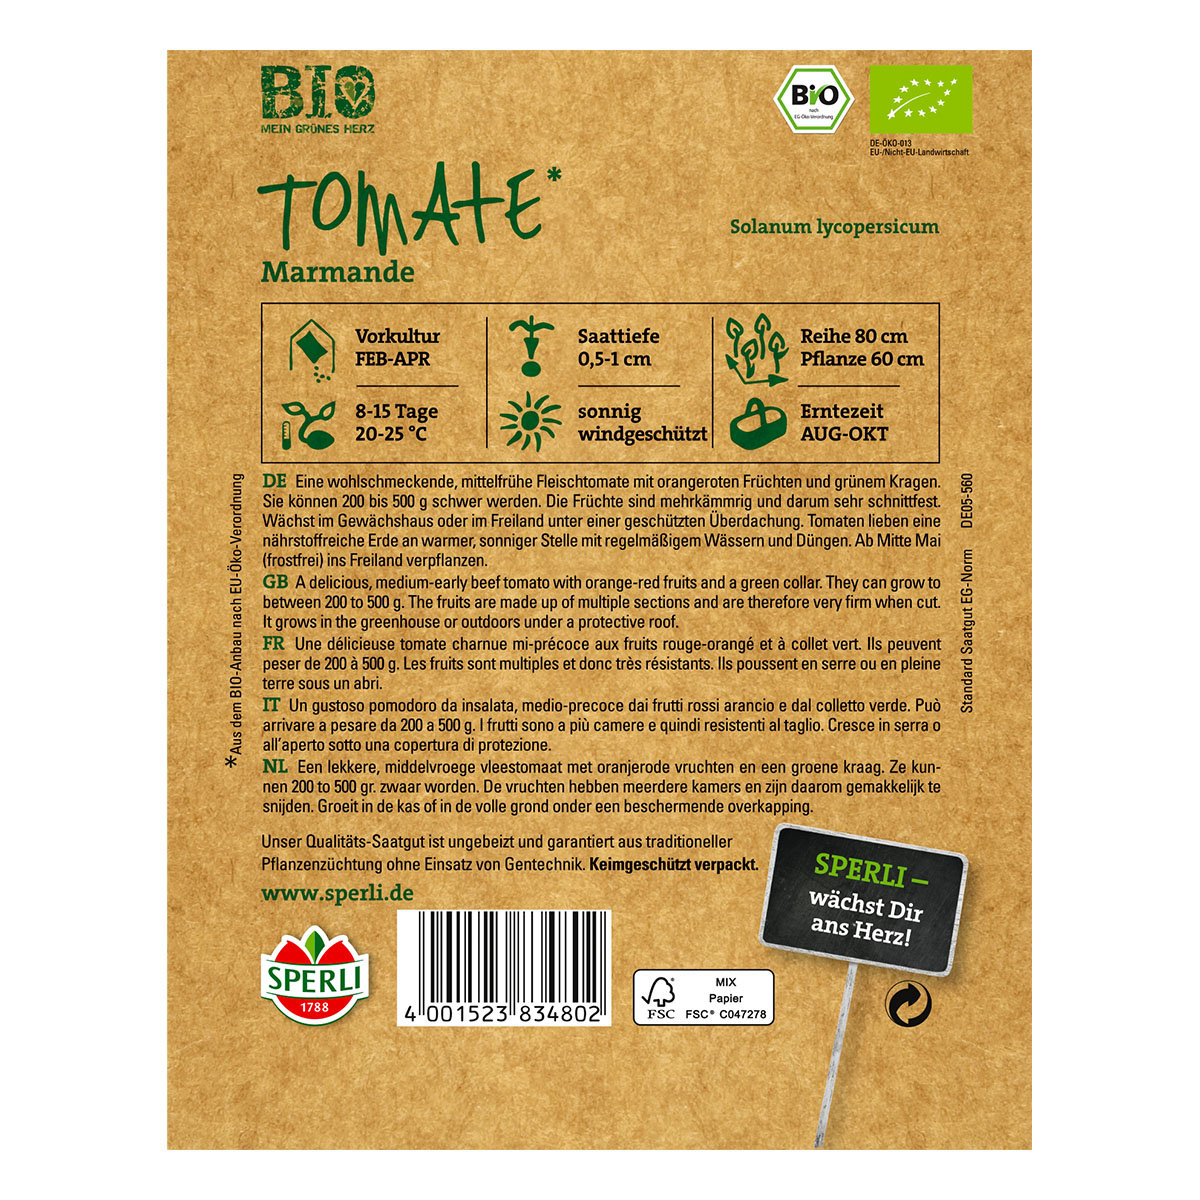 BIO Tomatensamen Marmande | #2